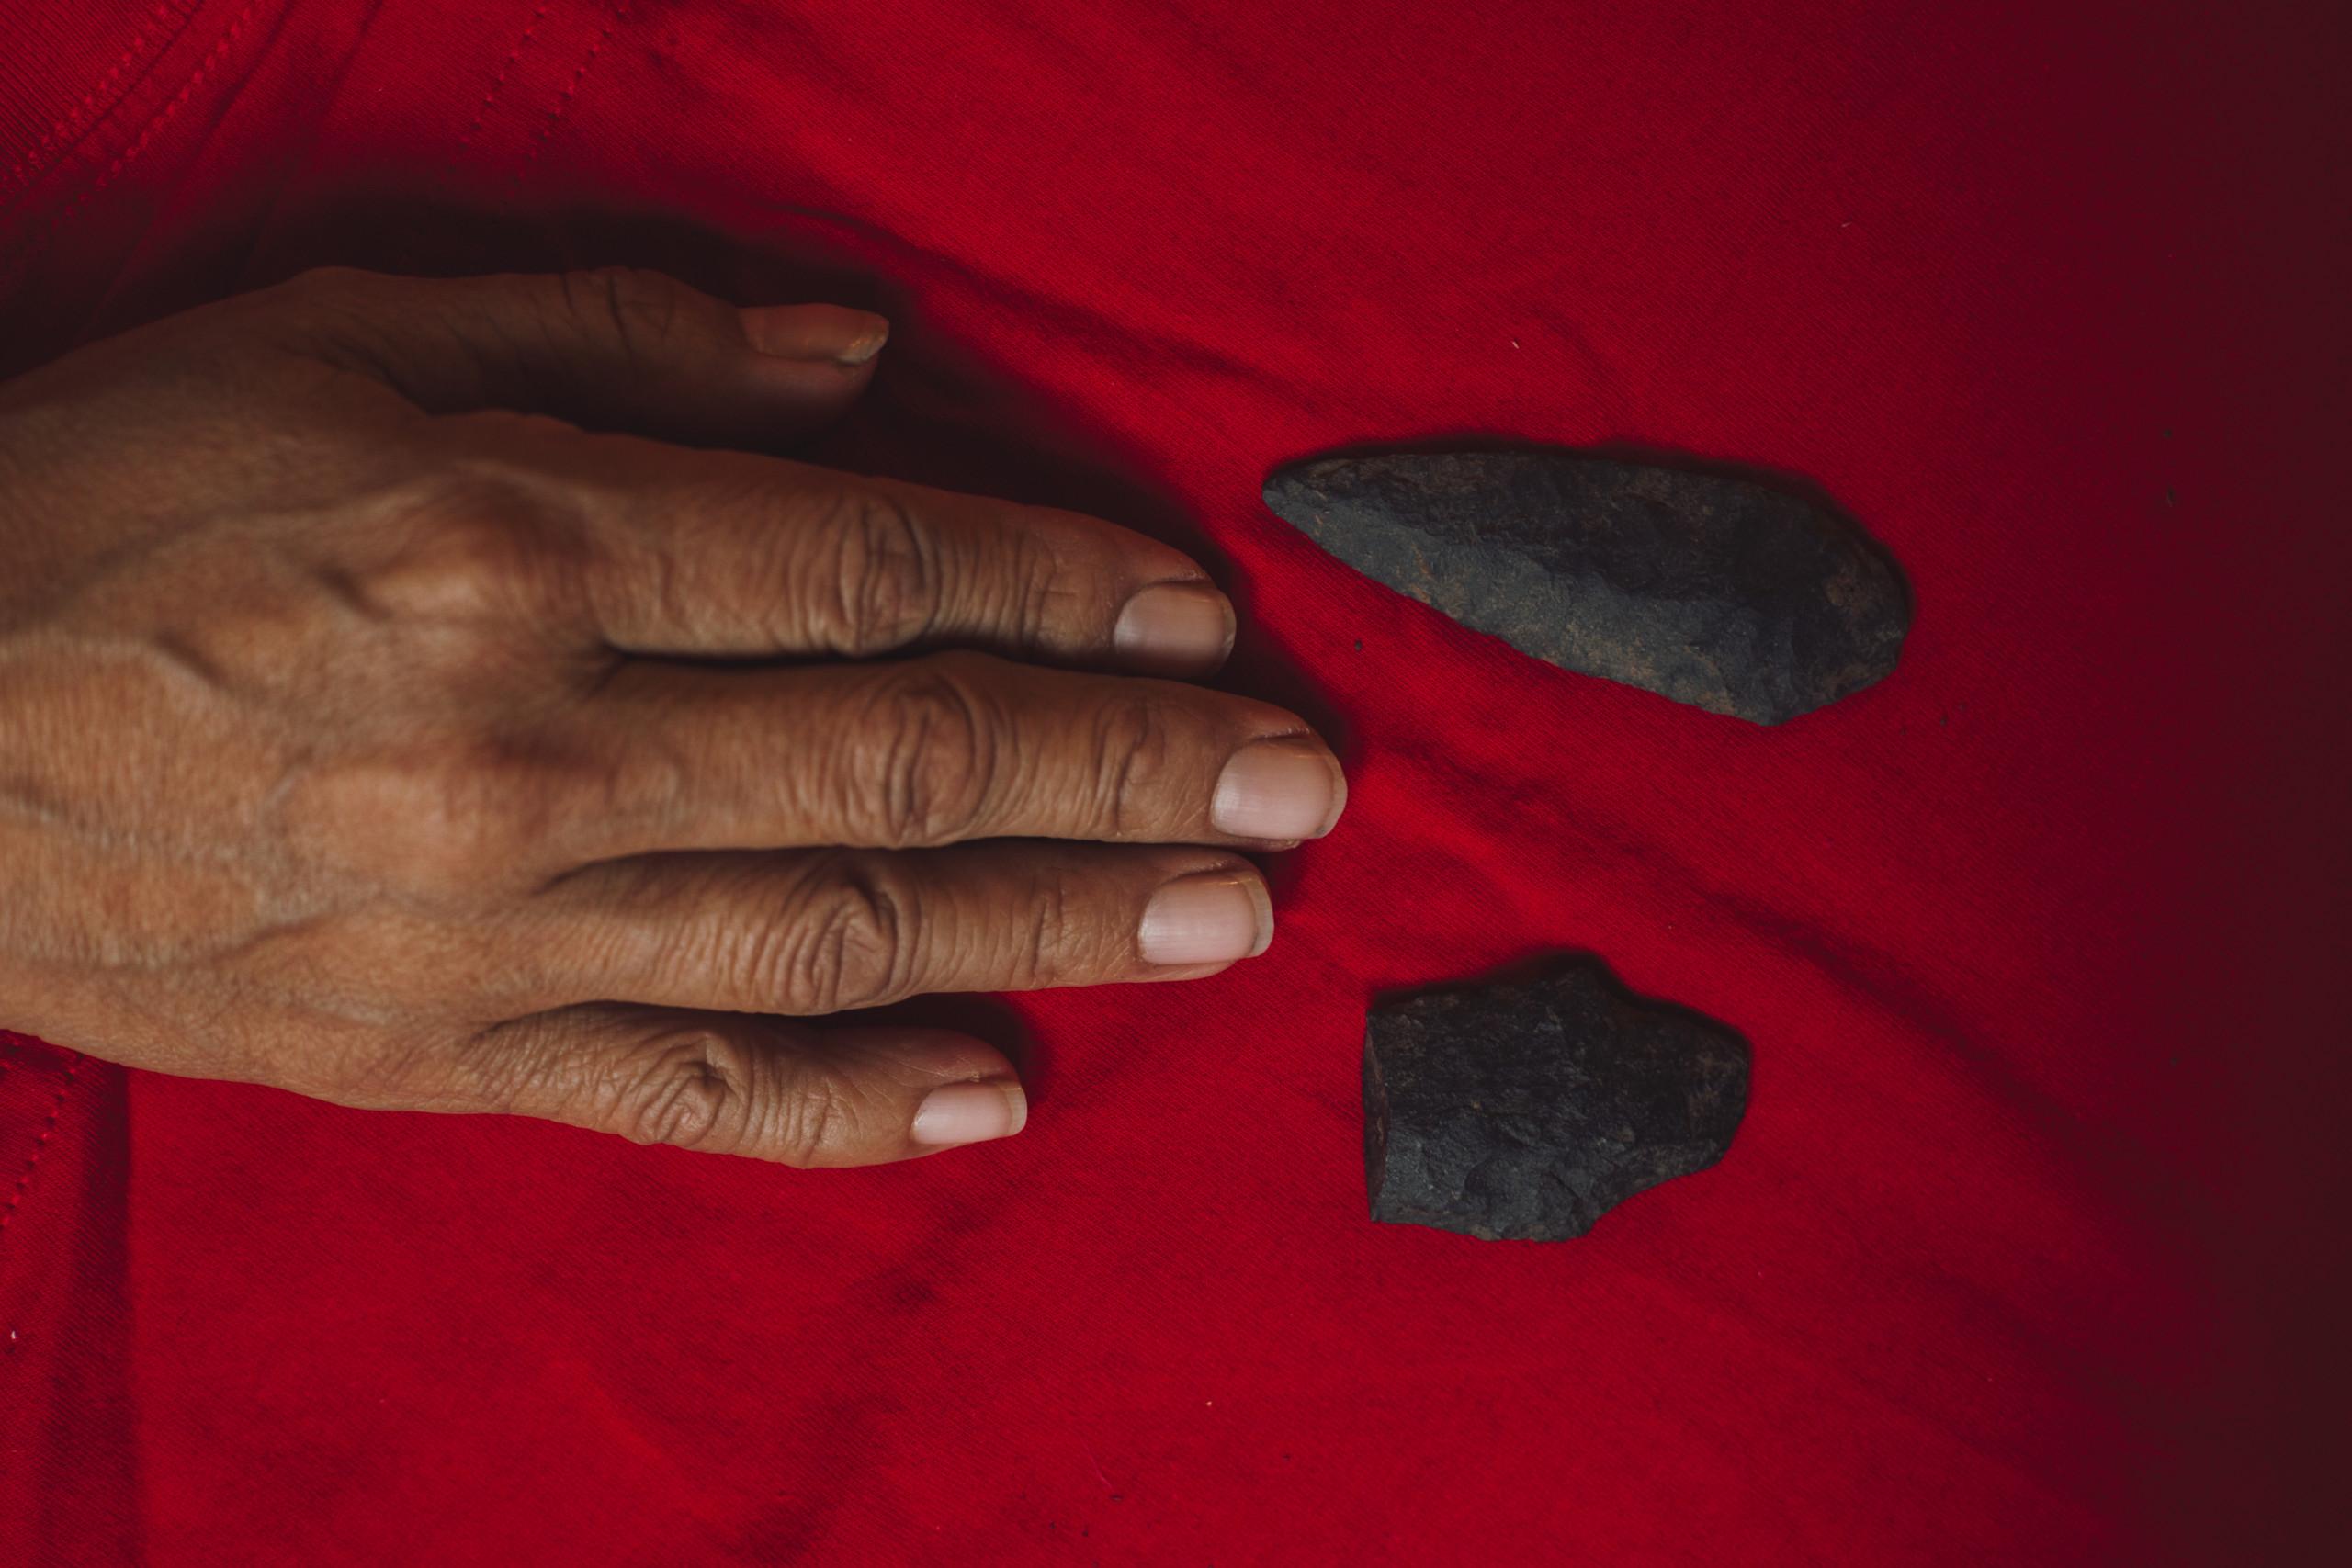 Unist'ot'en lithic stone tools